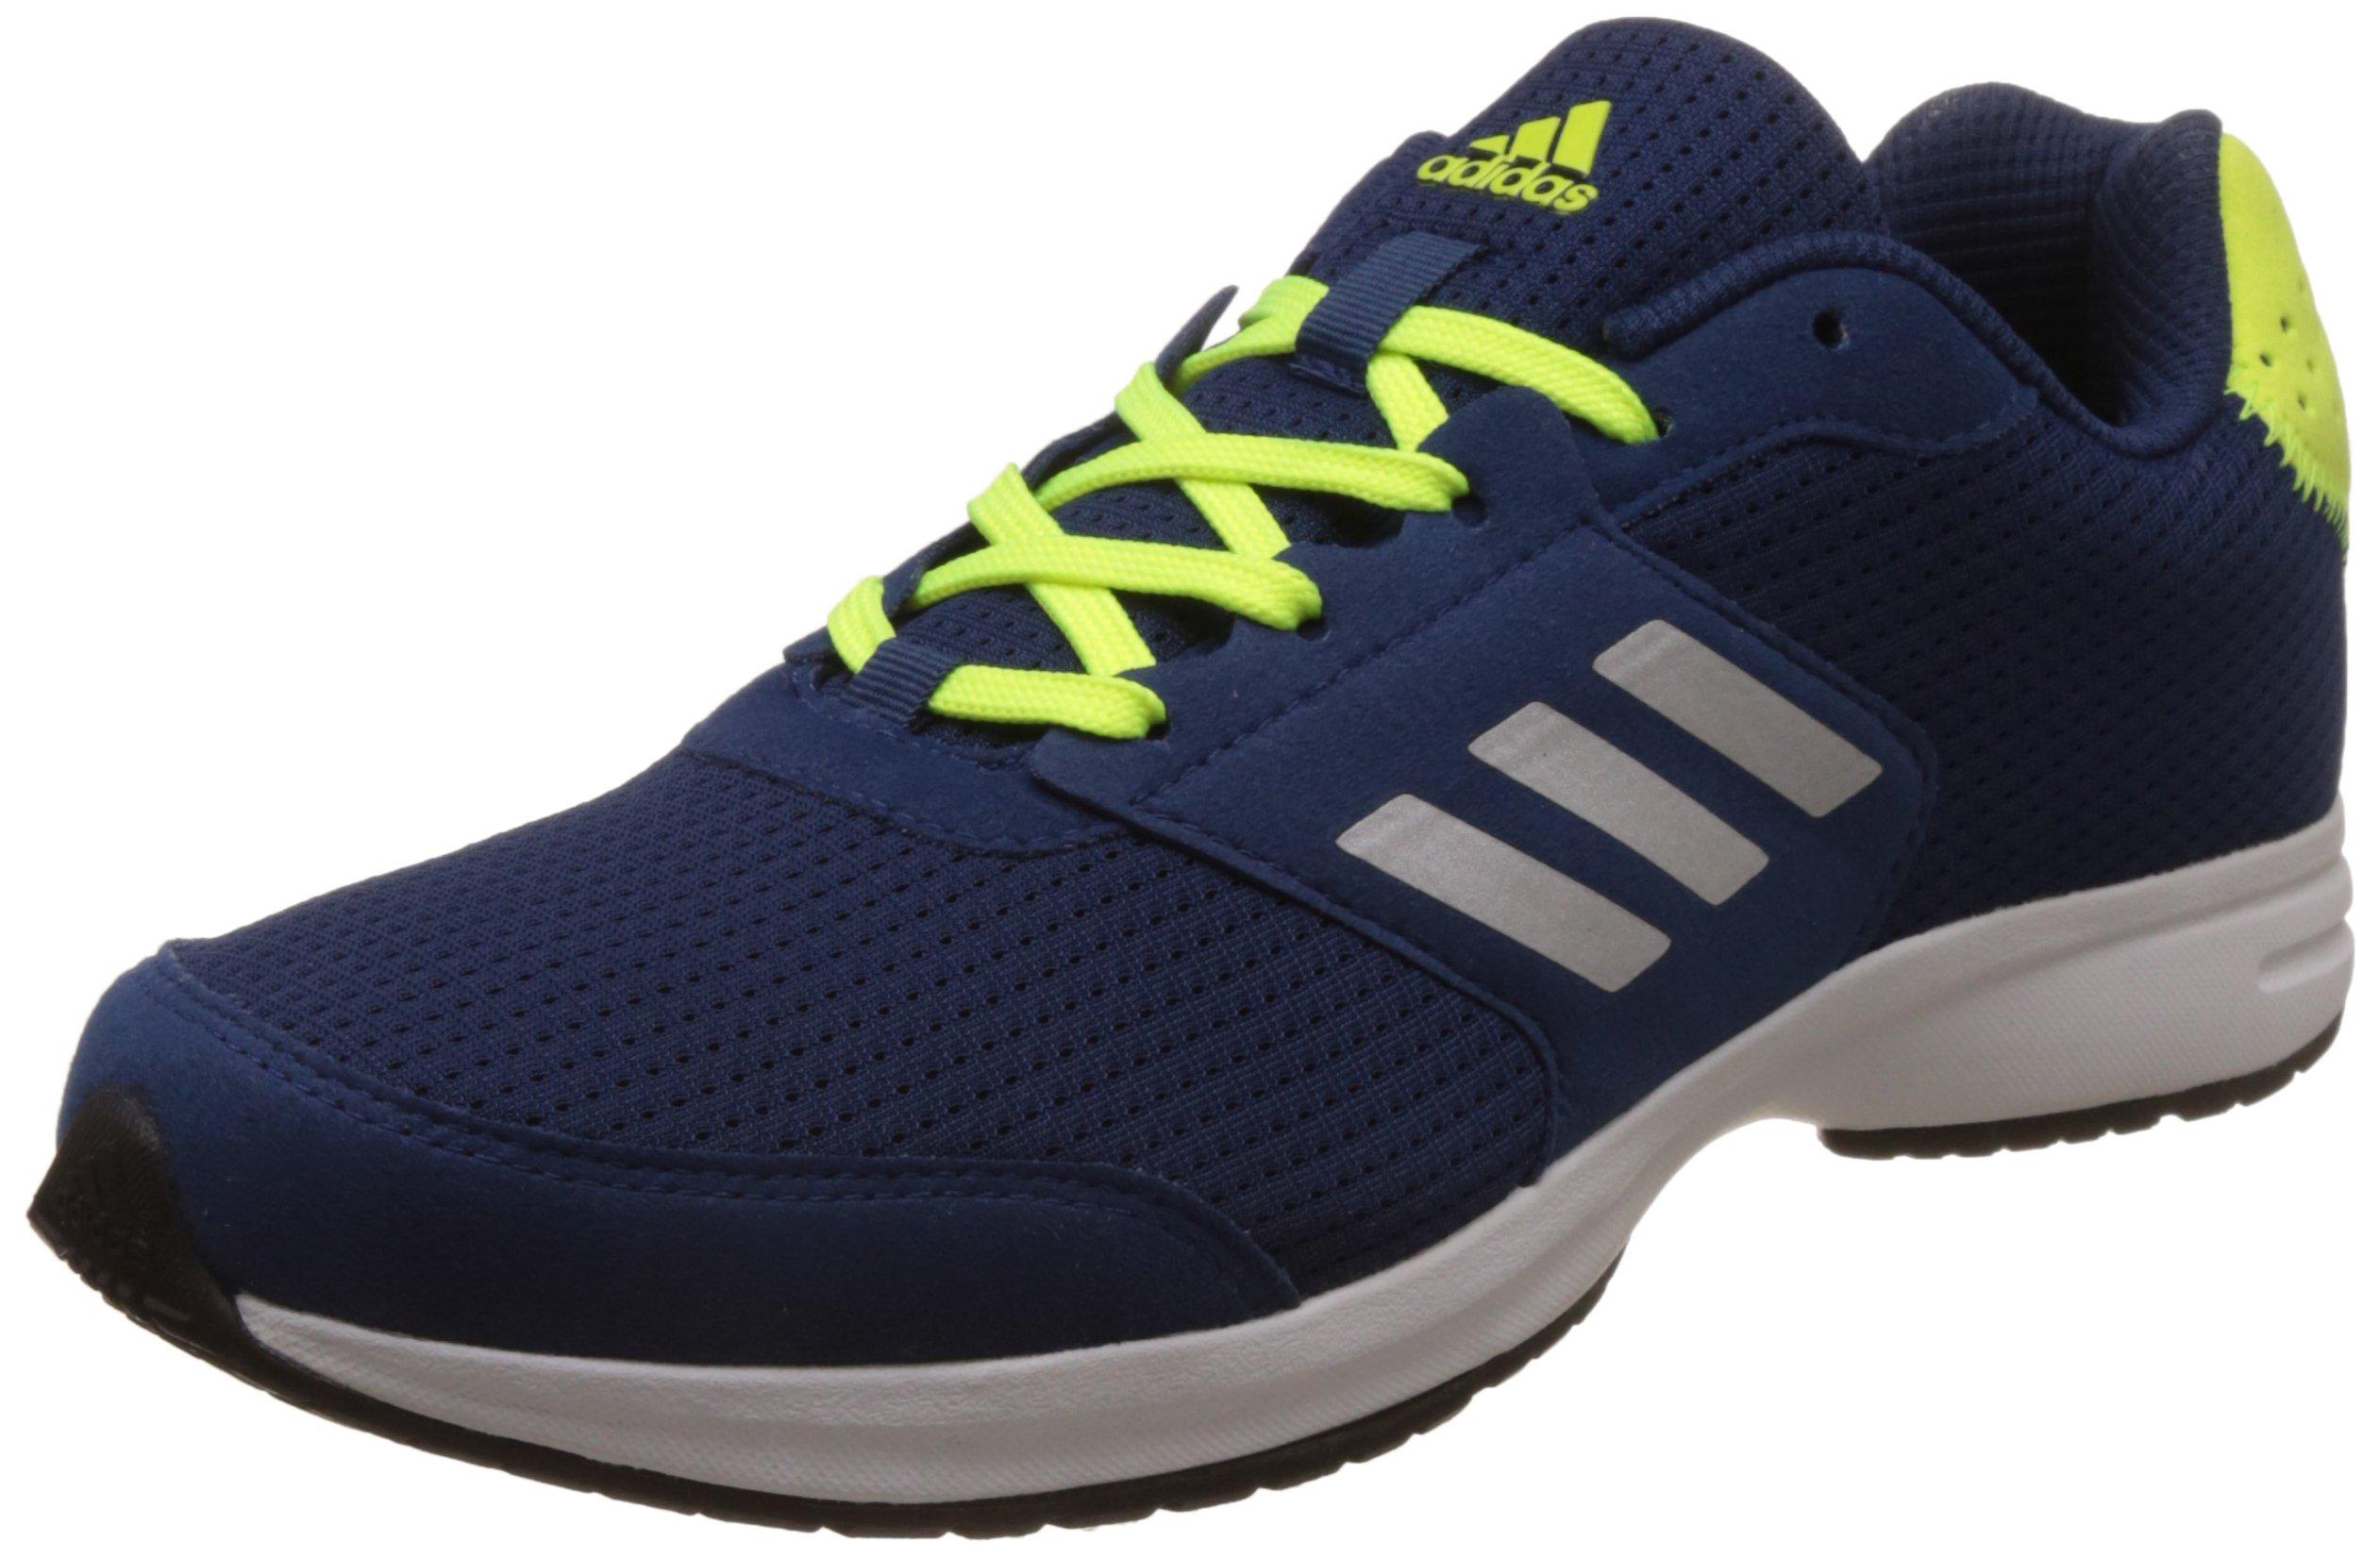 adidas calzature sportive per l'uomo: comprare scarpe sportive adidas per uomo online